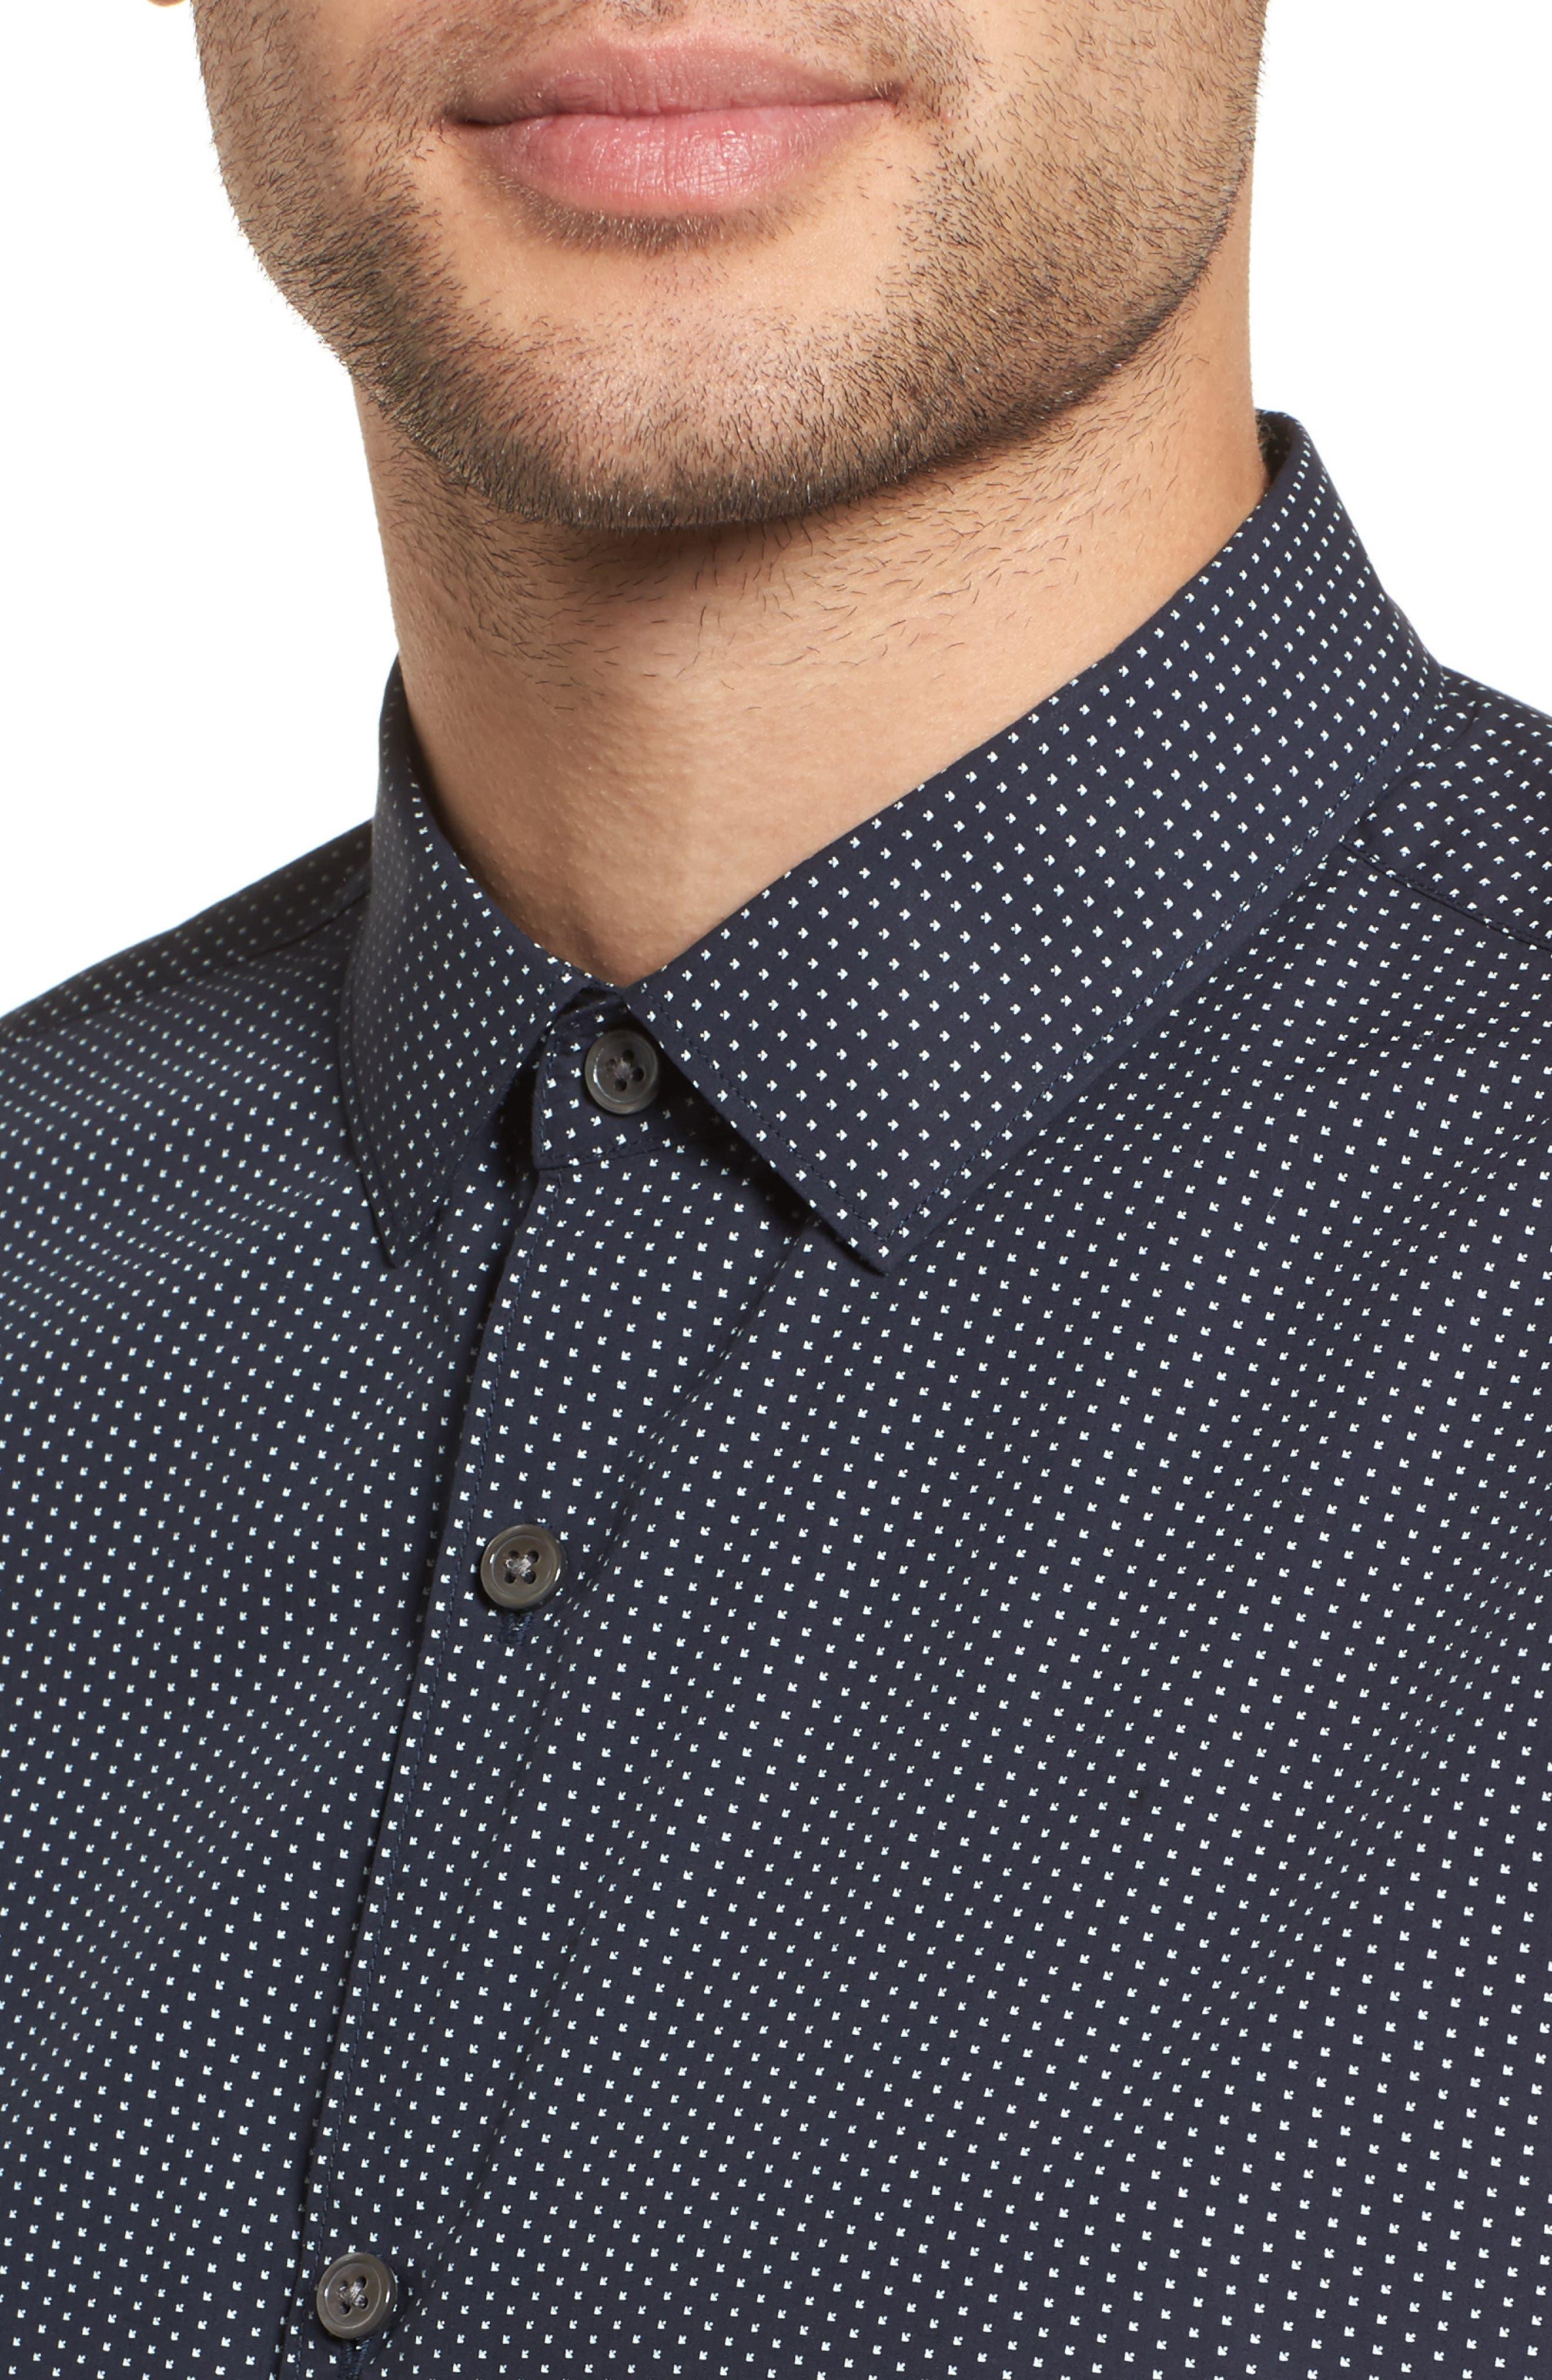 Murray Slim Fit Sport Shirt,                             Alternate thumbnail 8, color,